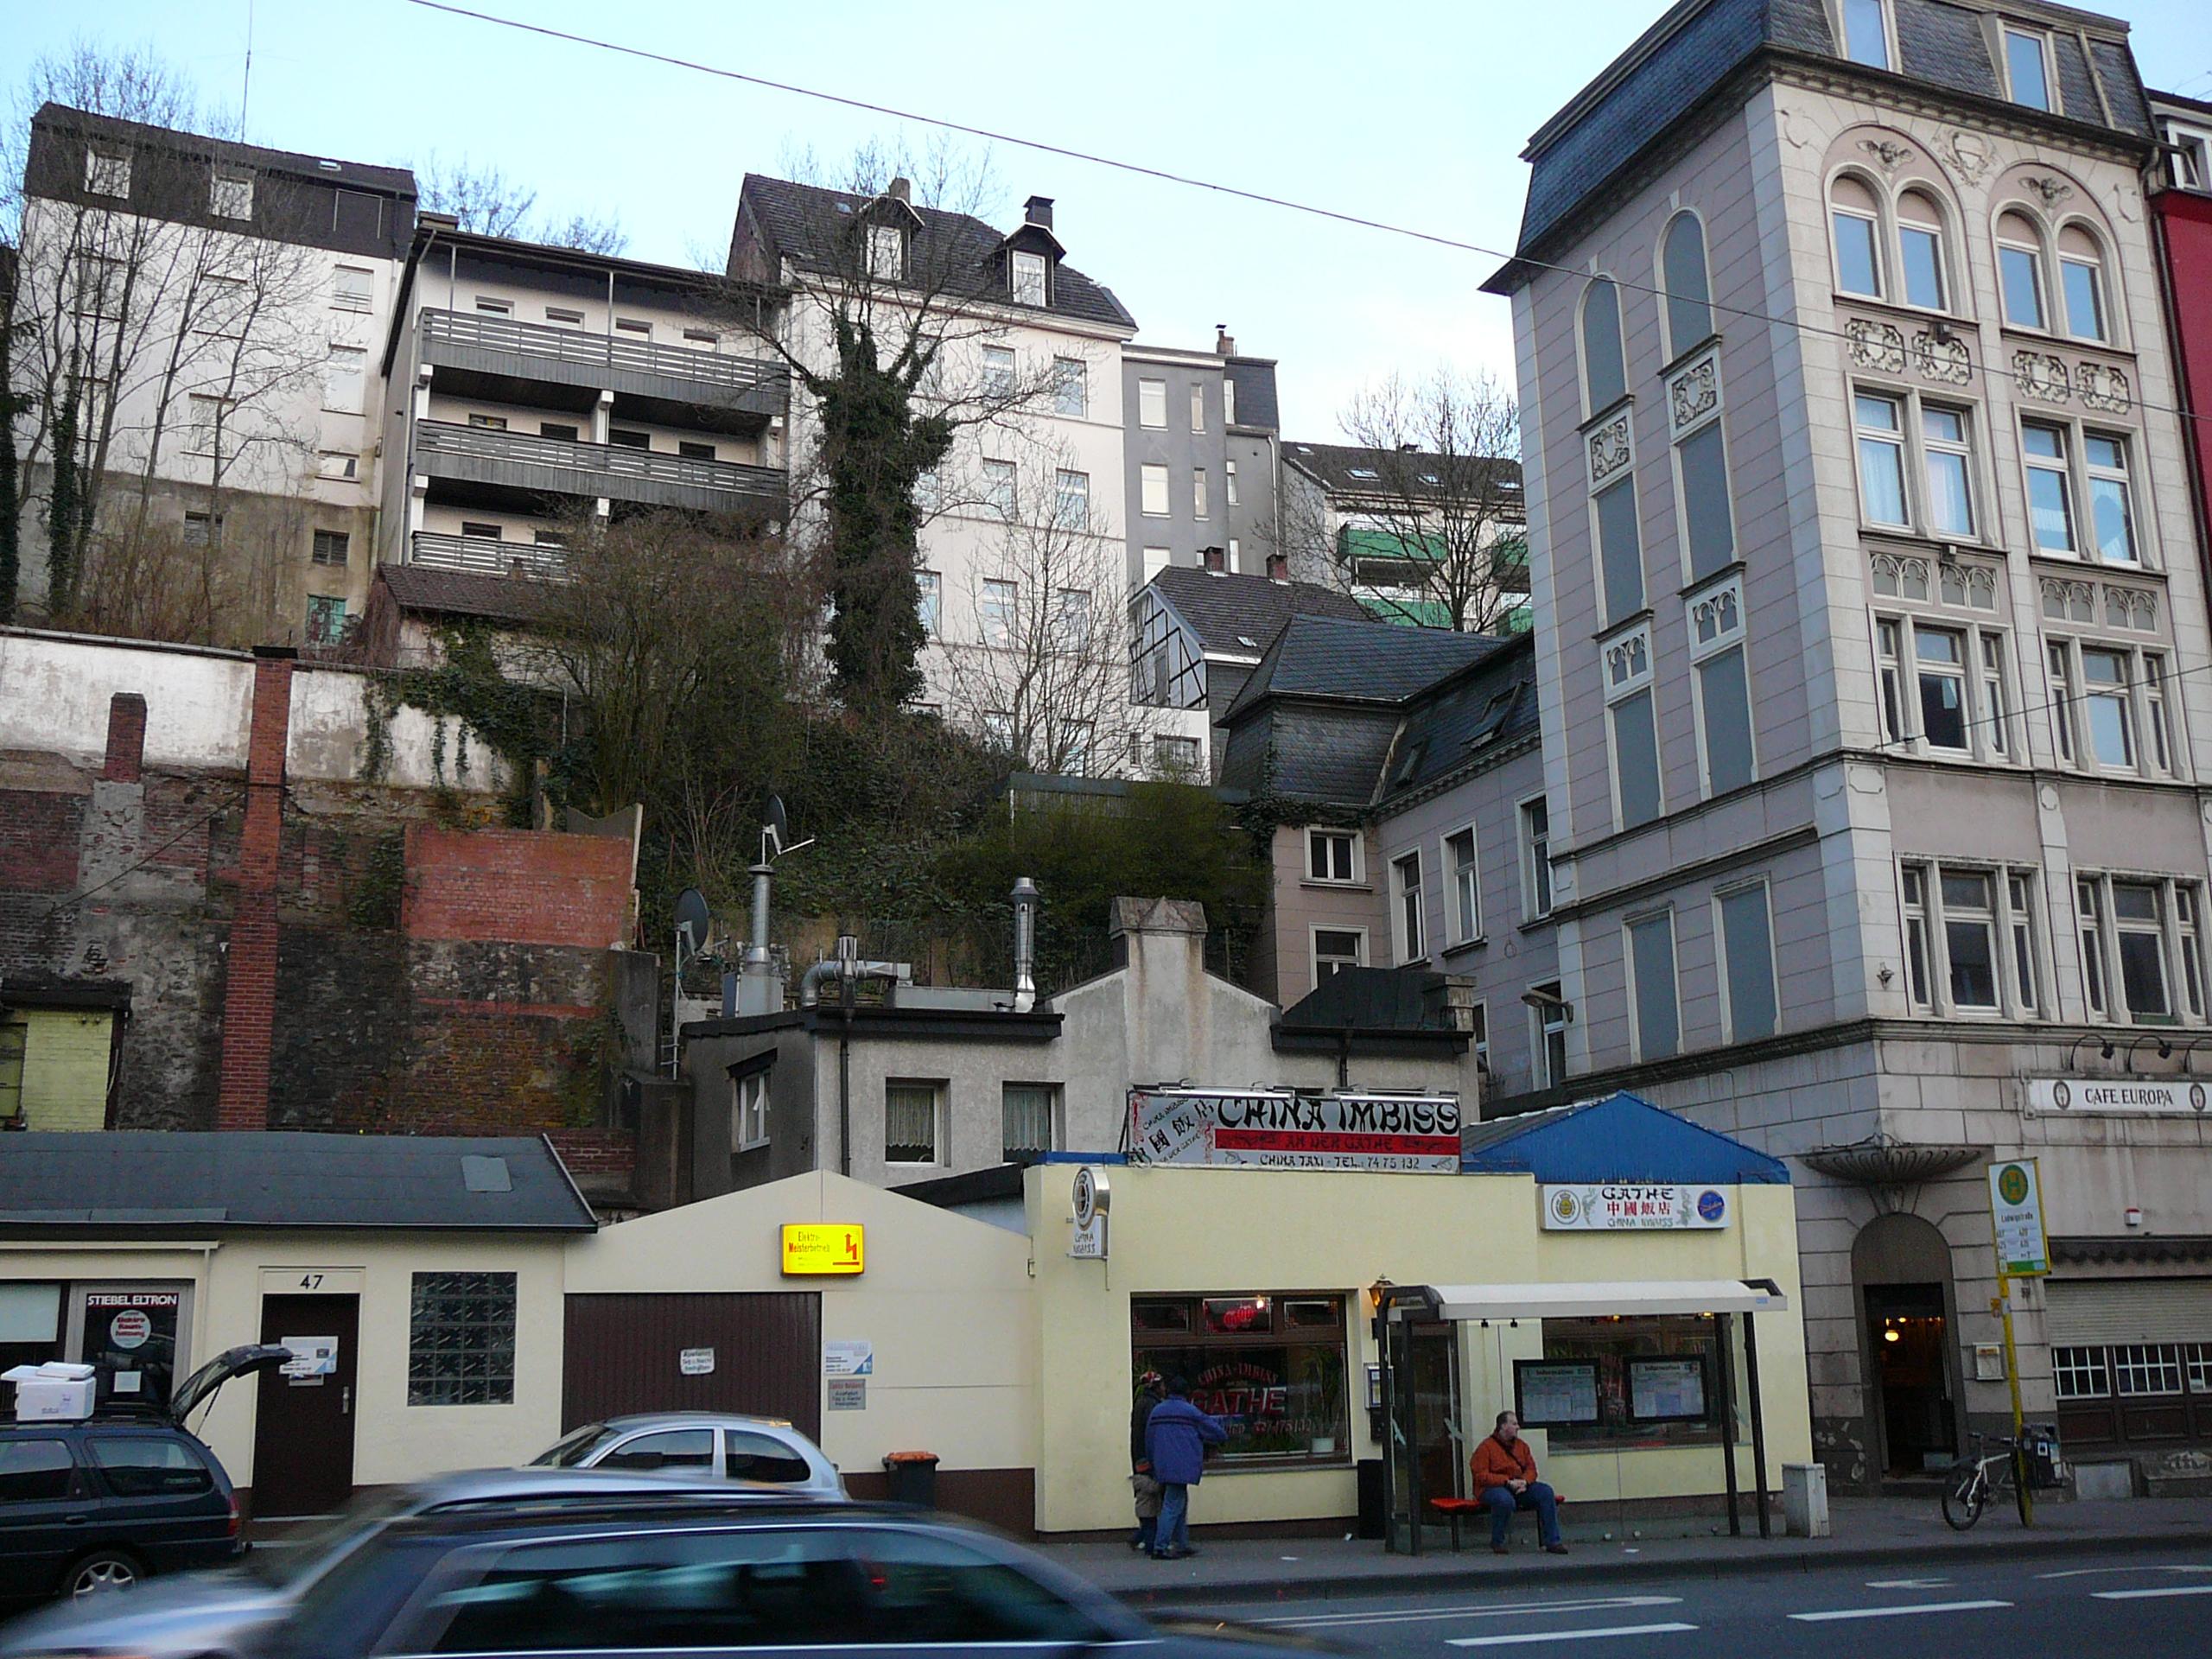 Gathe Wuppertal